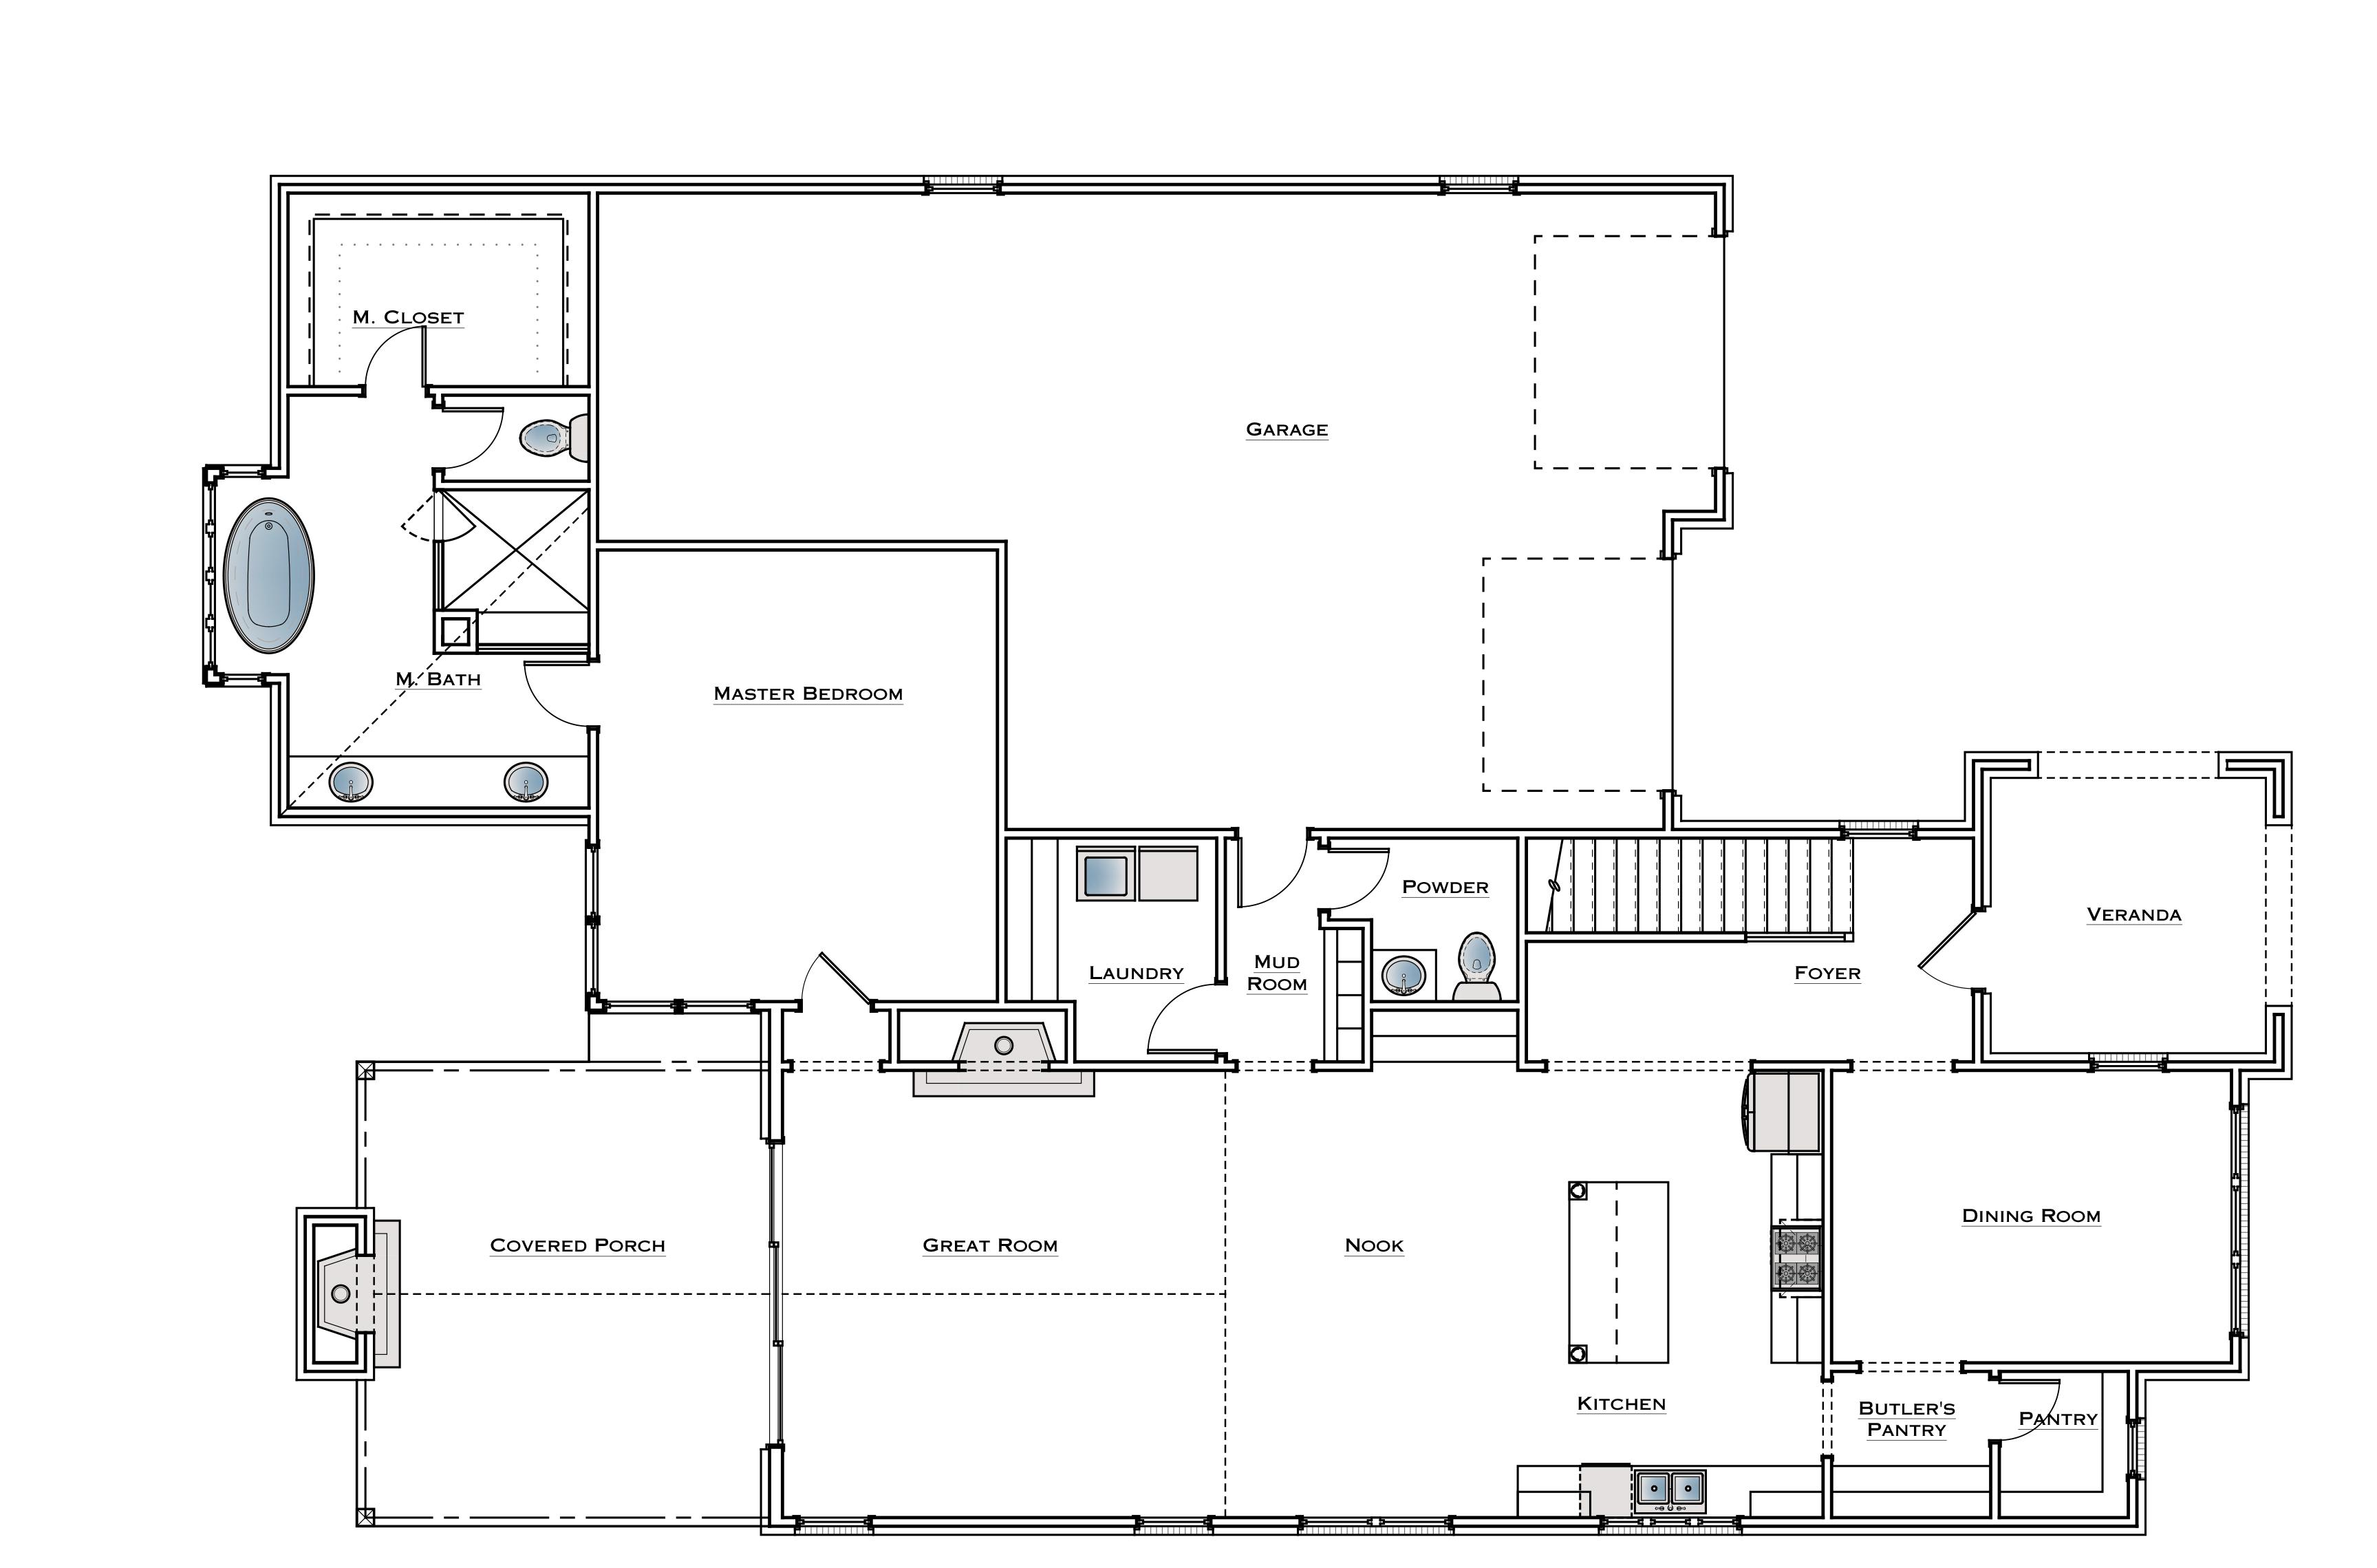 Lot 35 - Main Level